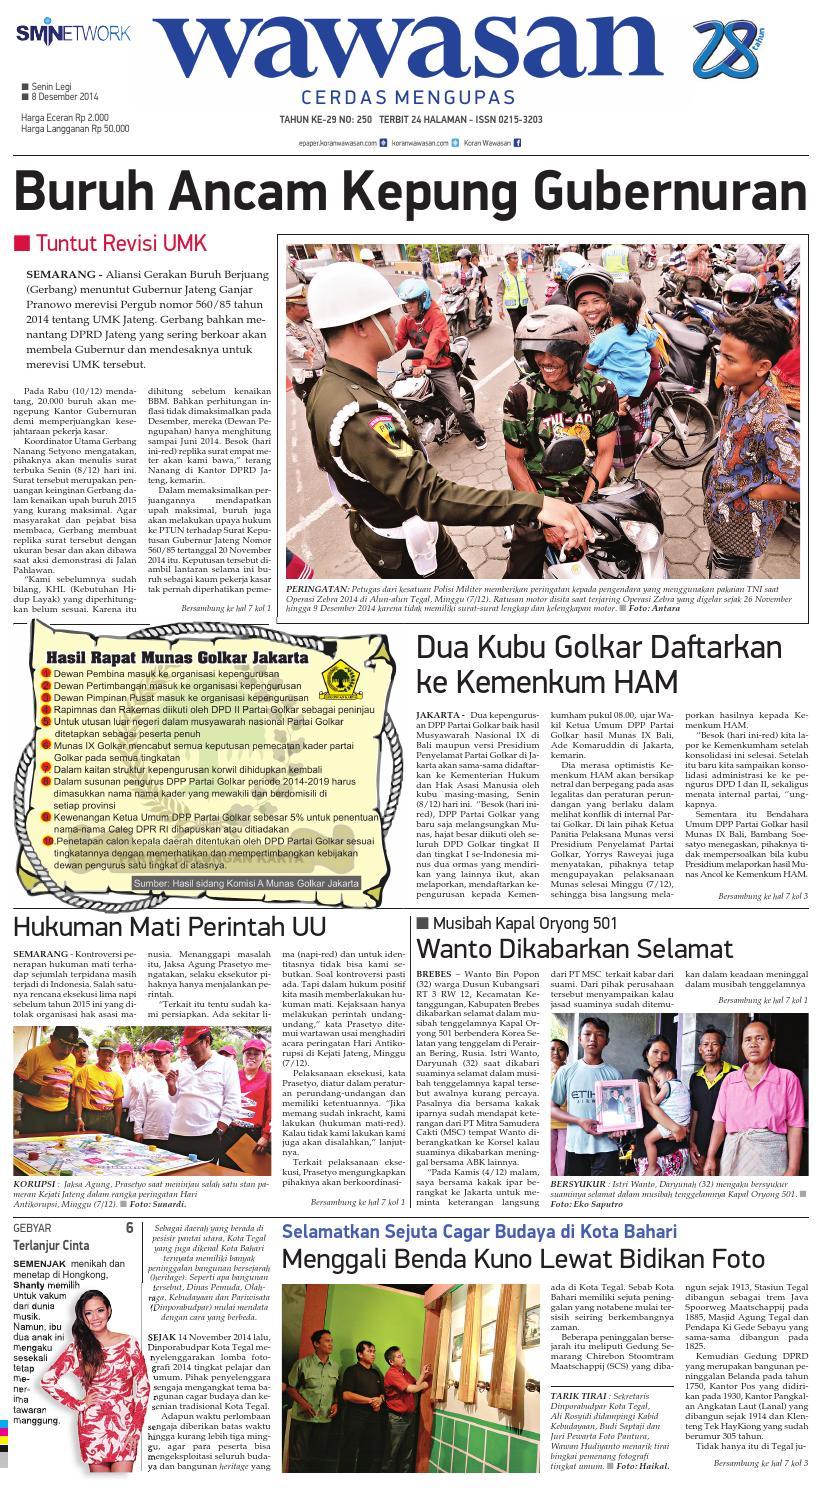 Wawasan 08 Desember 2014 By Koran Pagi Wawasan Issuu